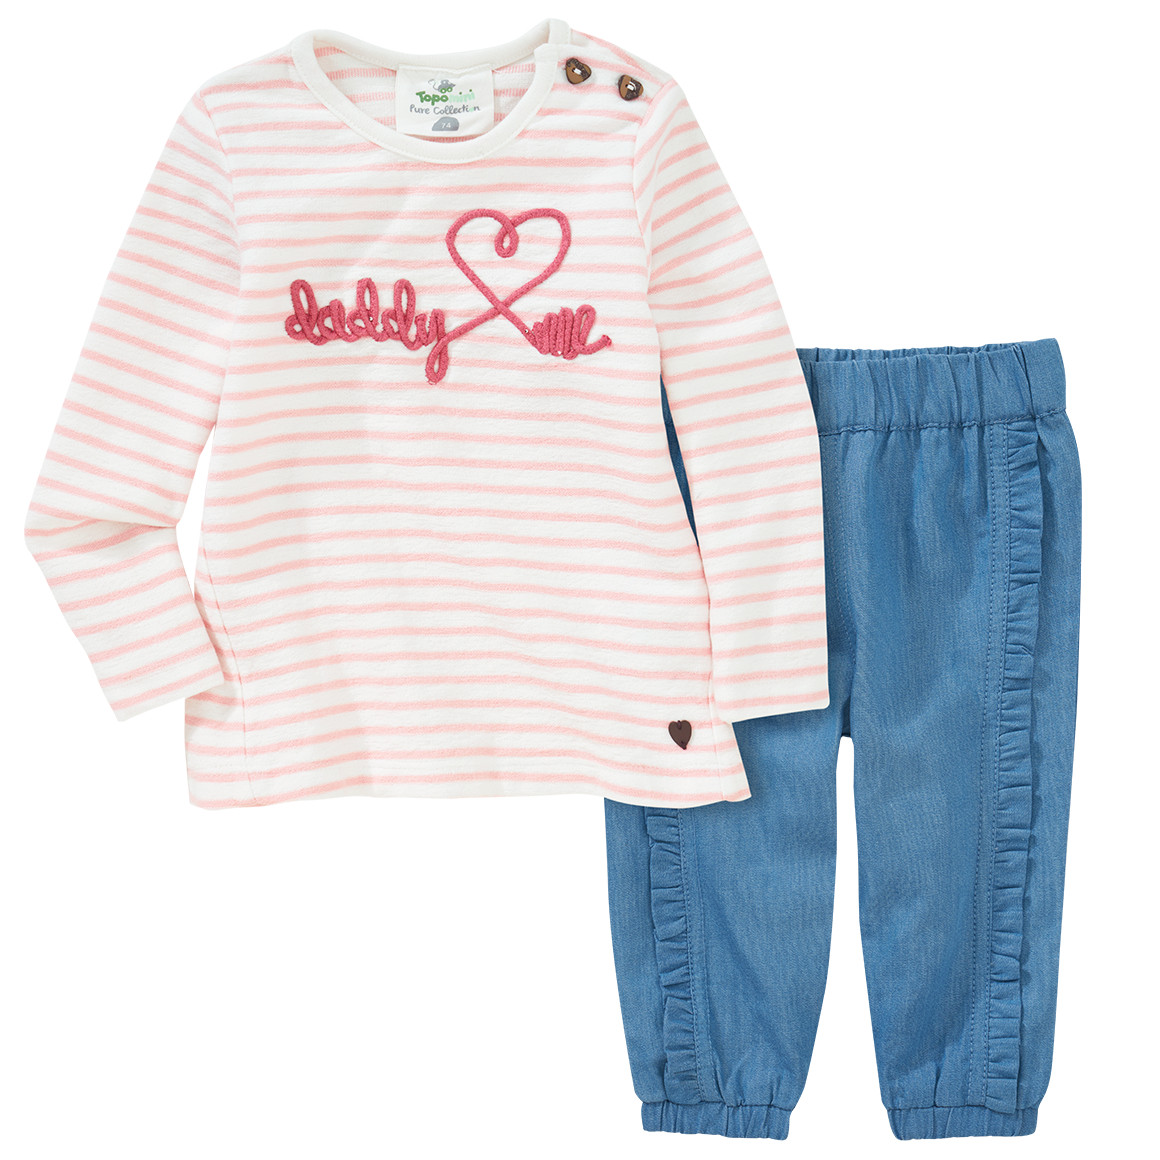 Babysets - Baby Langarmshirt und Hose im Set - Onlineshop Ernstings family